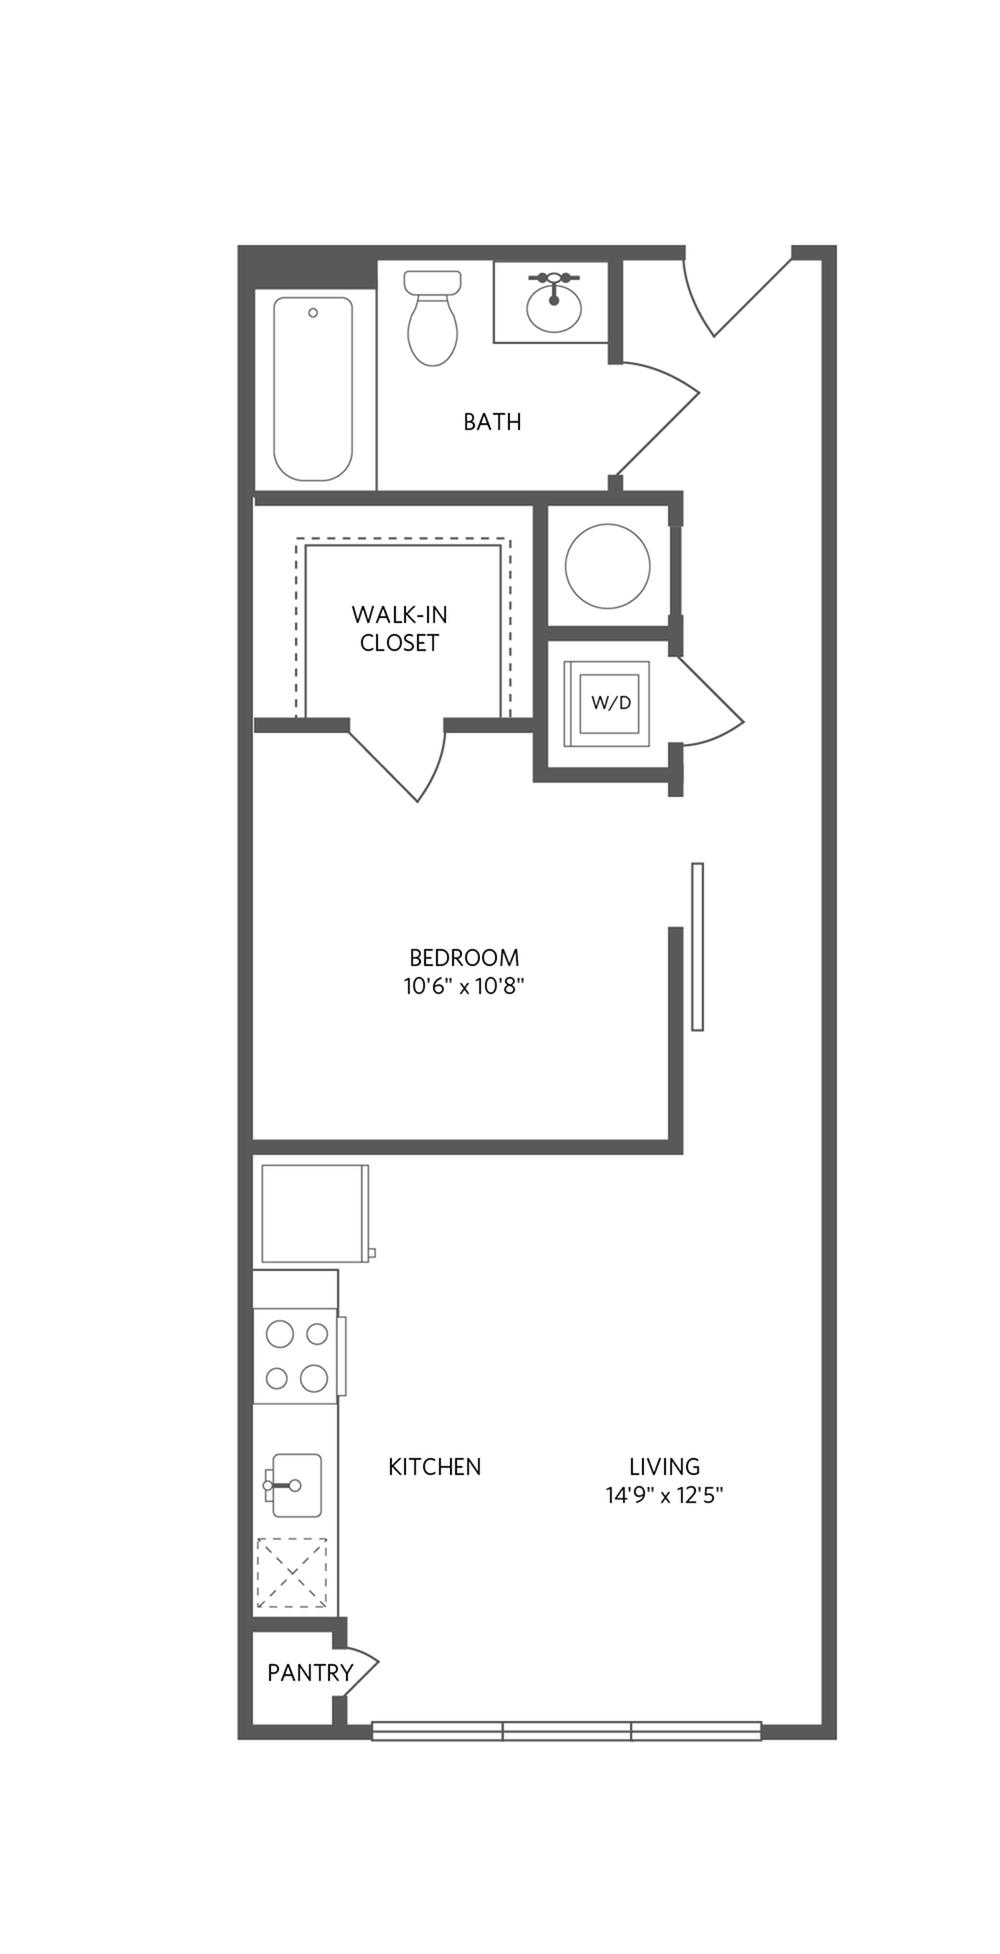 590 square foot one bedroom one bath apartment floorplan image